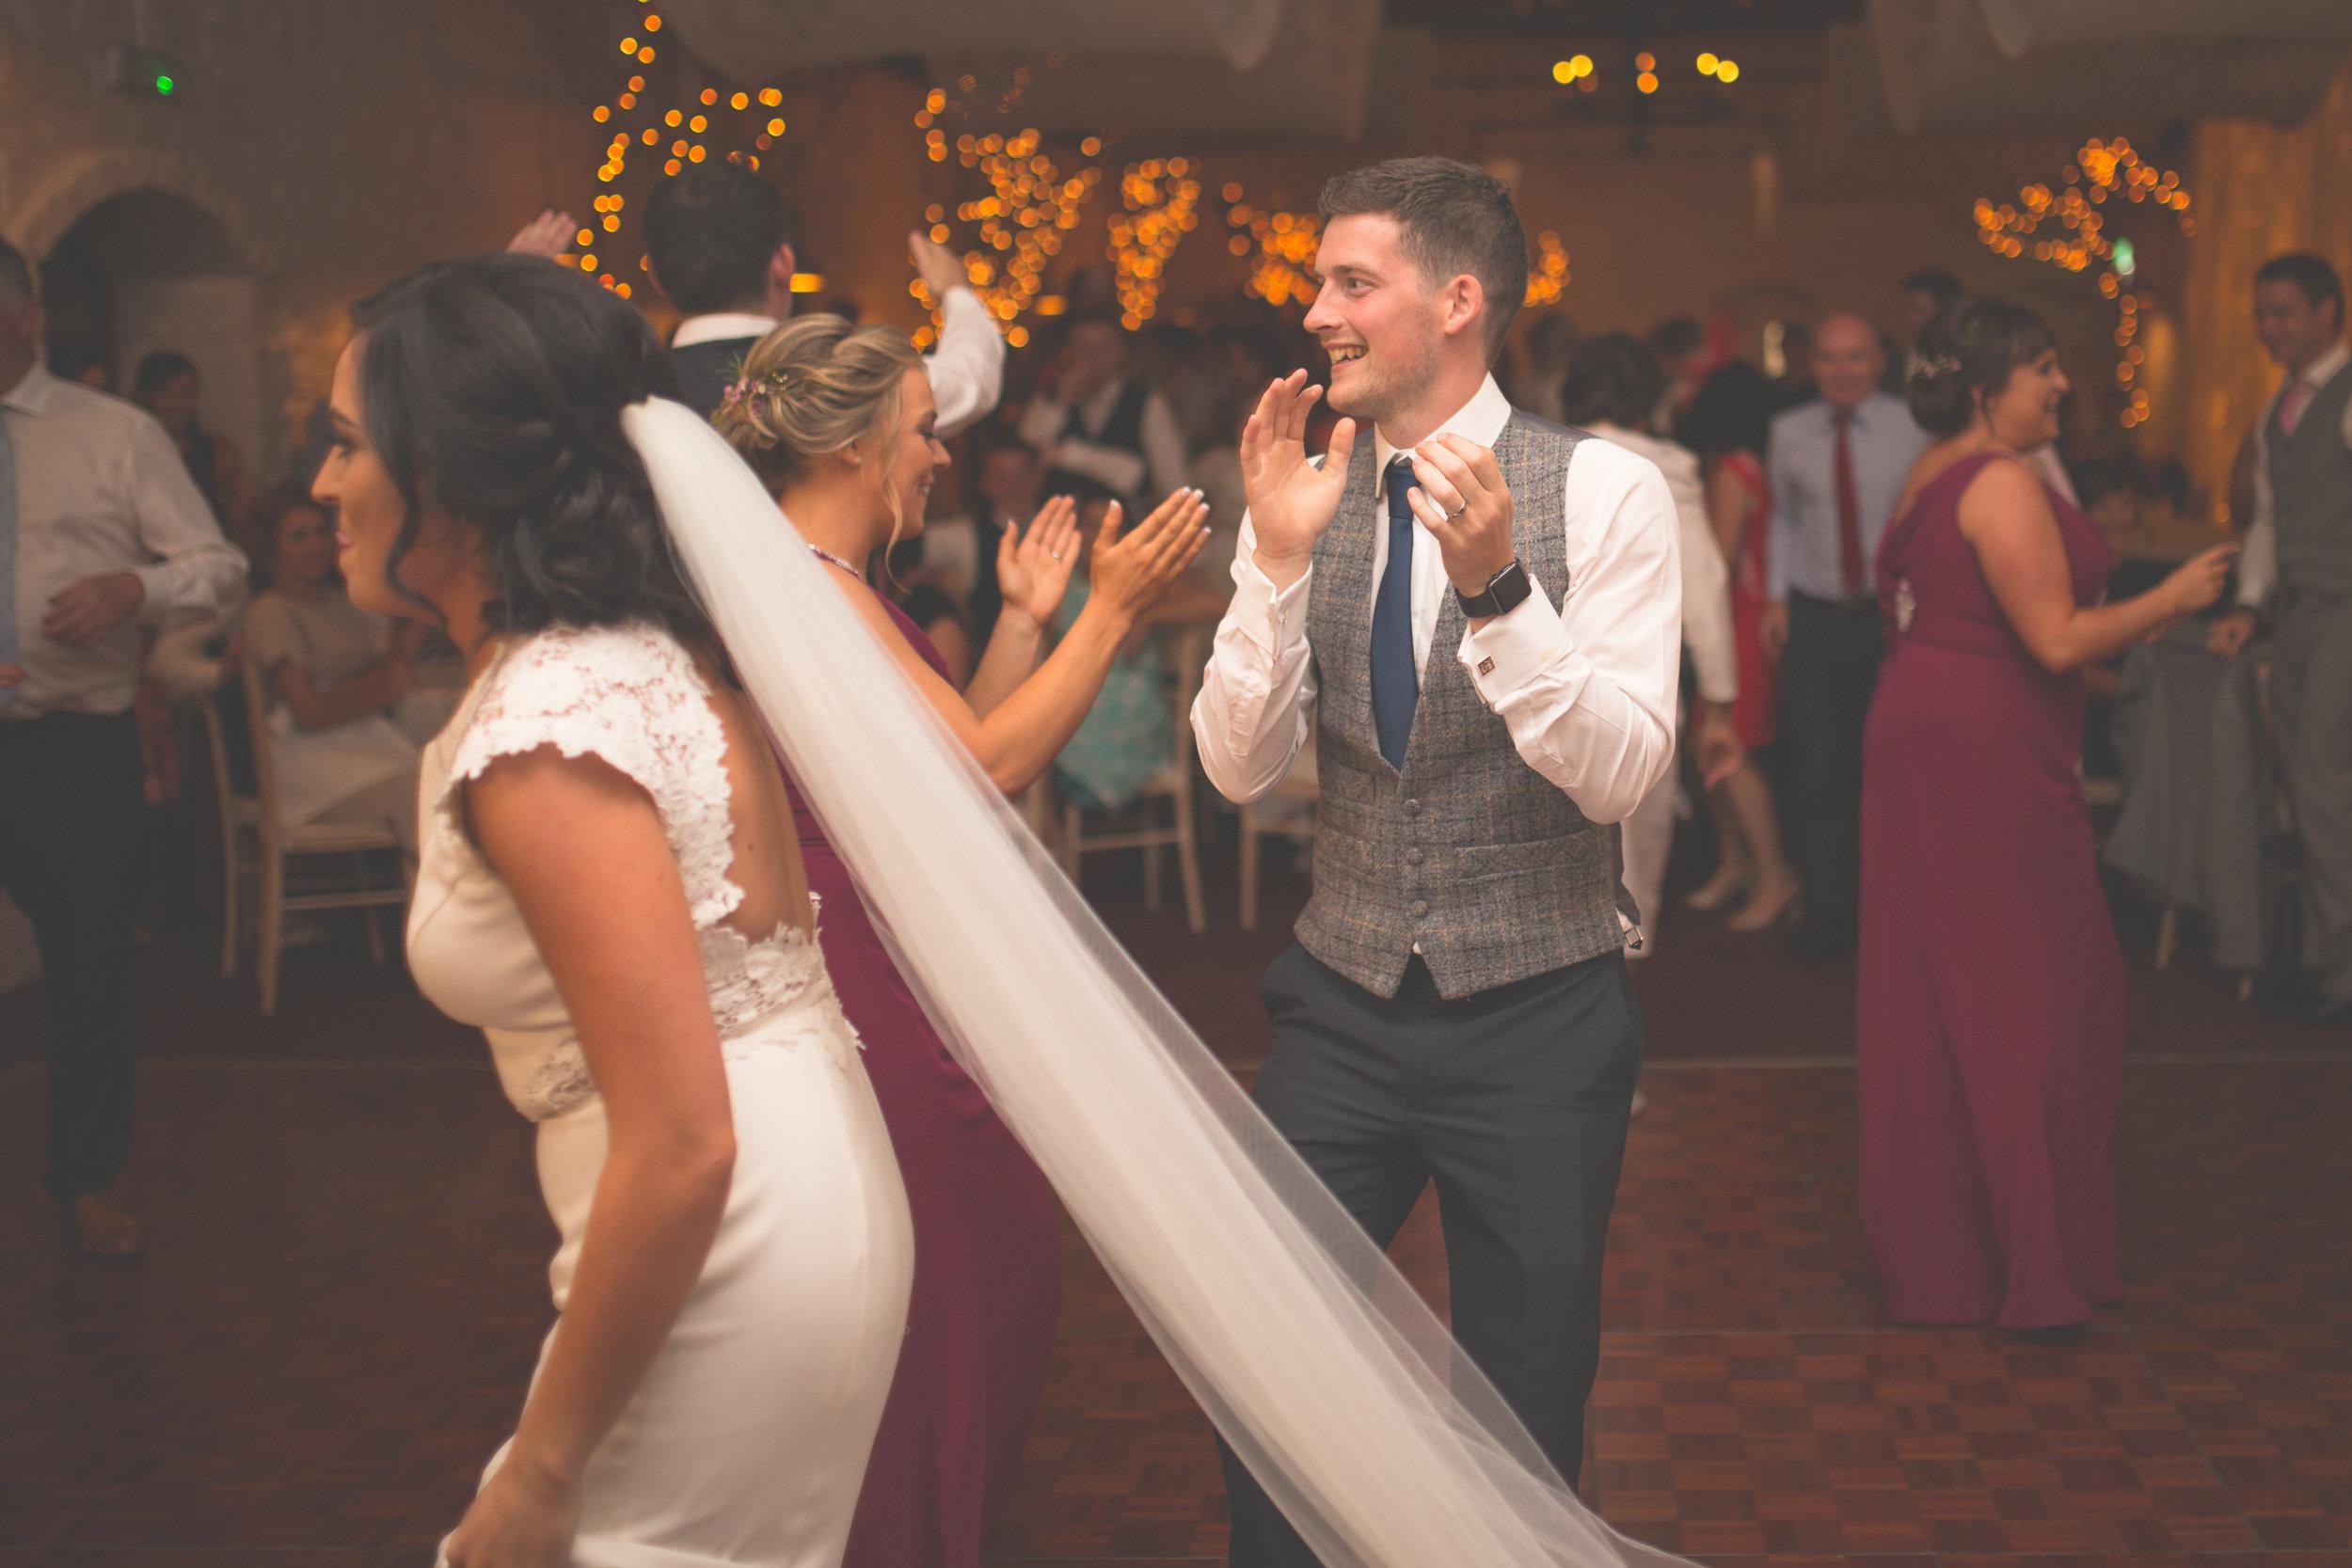 Brian McEwan Wedding Photography | Carol-Annee & Sean | The Dancing-54.jpg